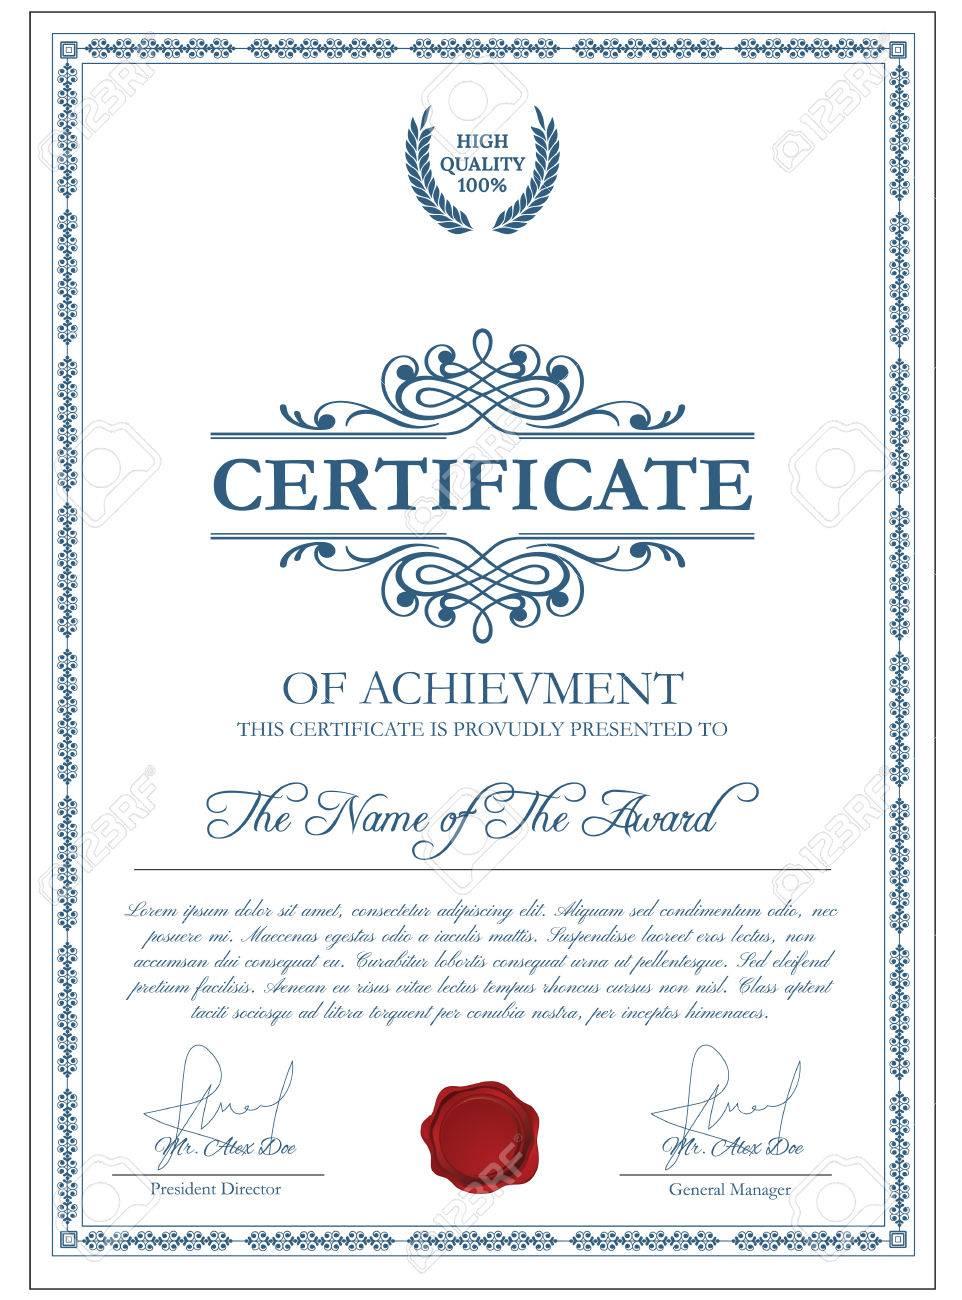 Life Membership Certificate Templates  Life Membership Certificate Template